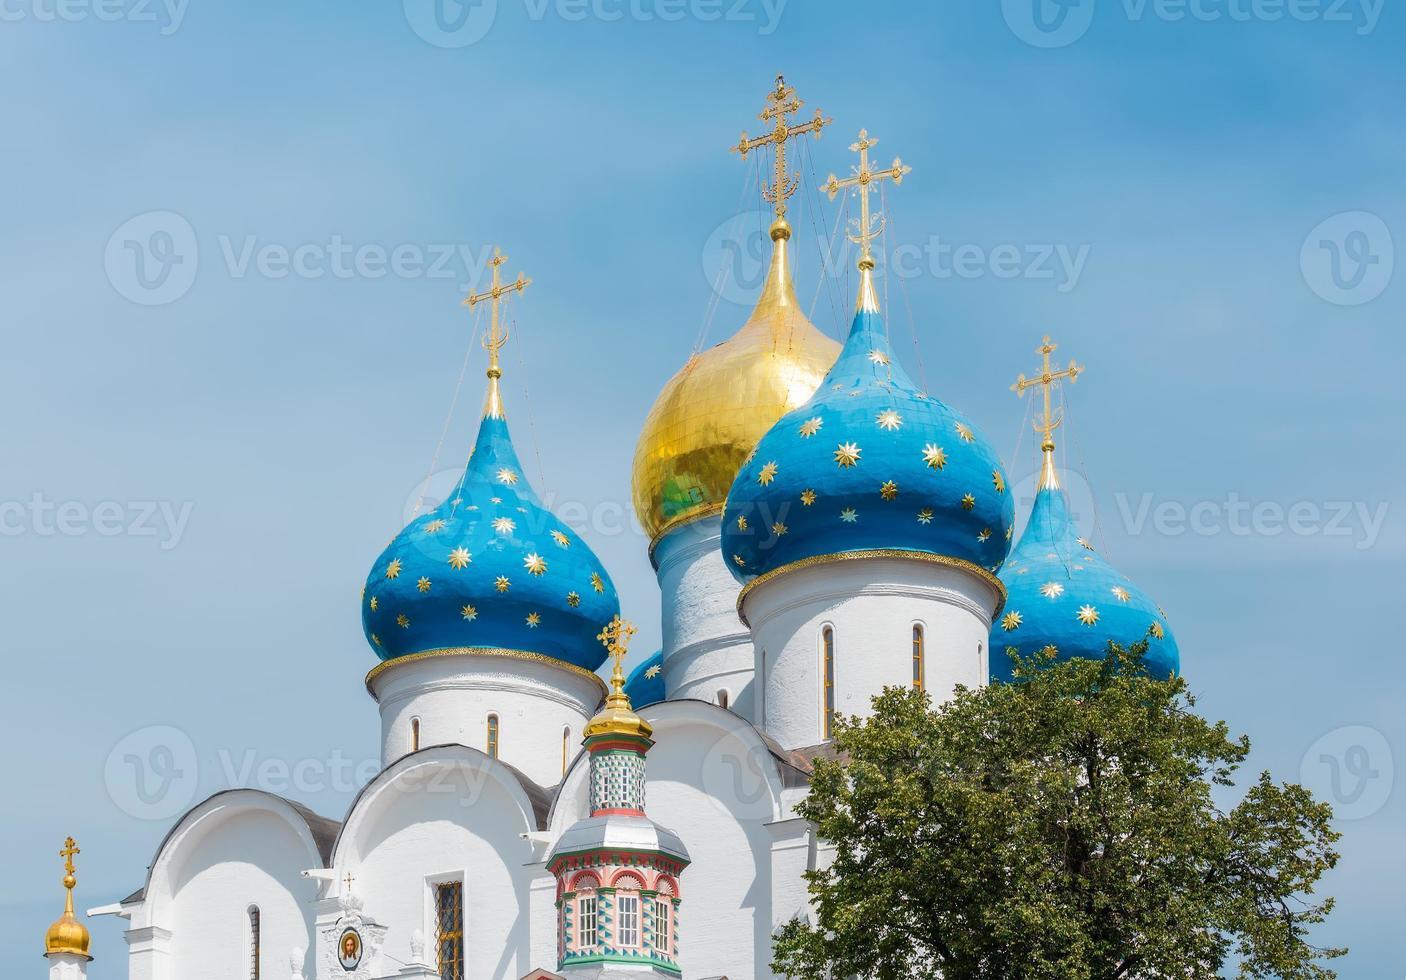 catedral de la residencia foto